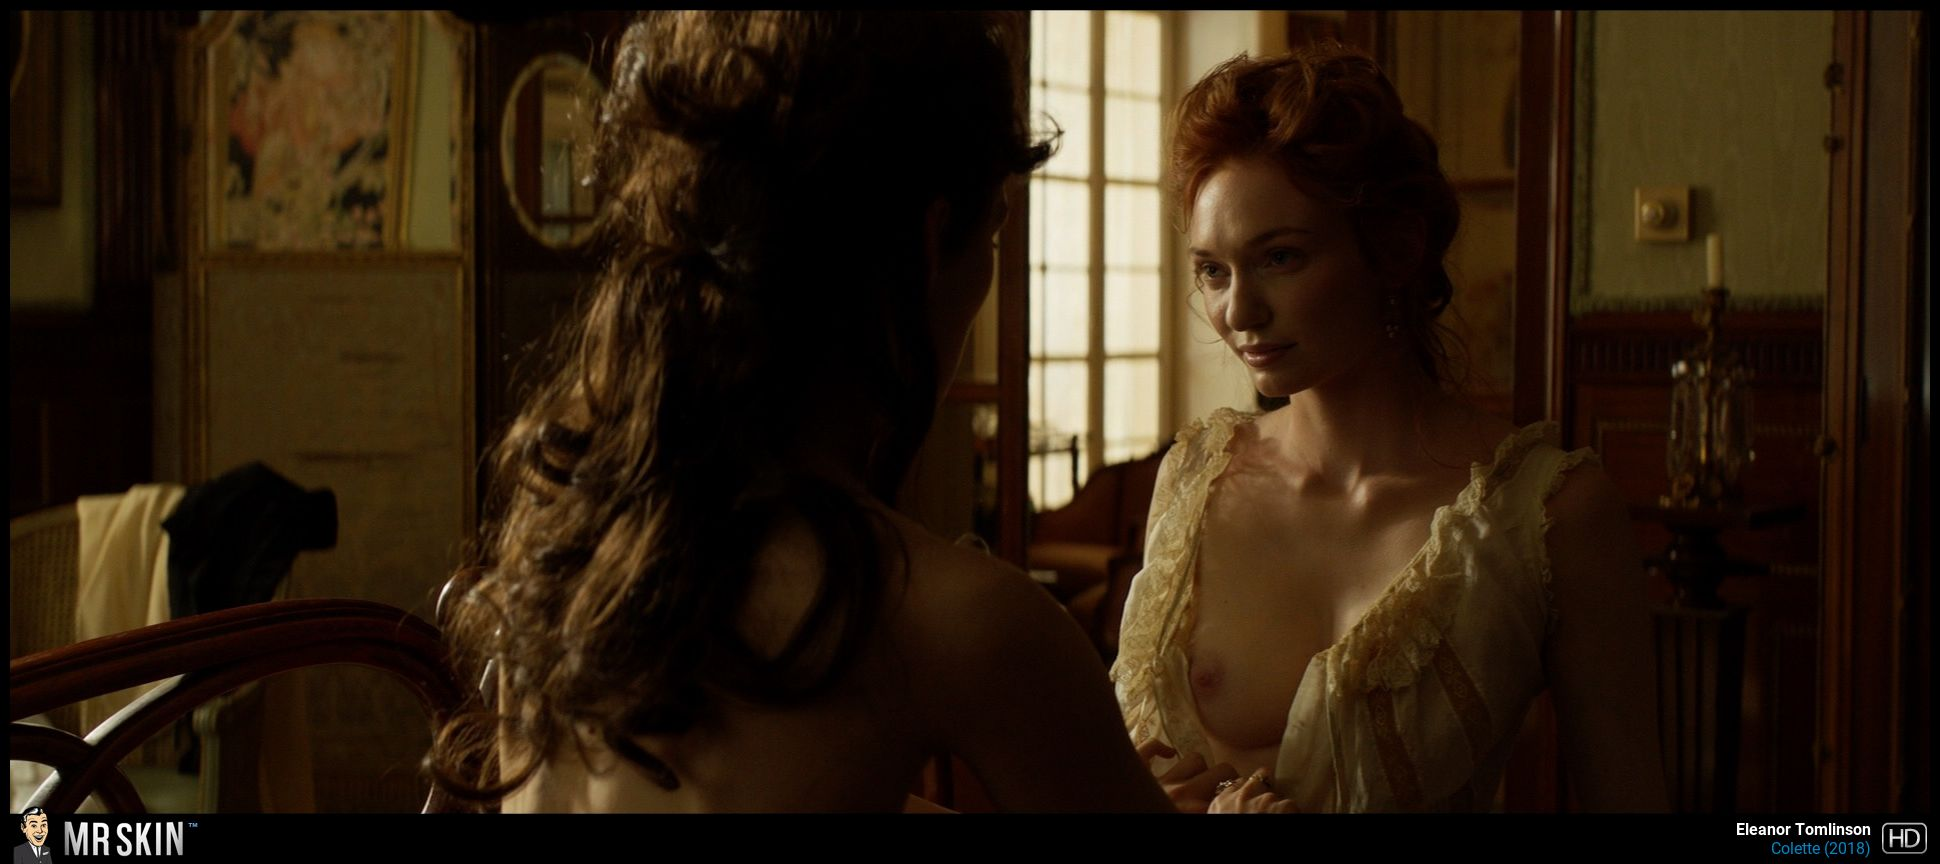 Eleanor Tomlinson in Colette